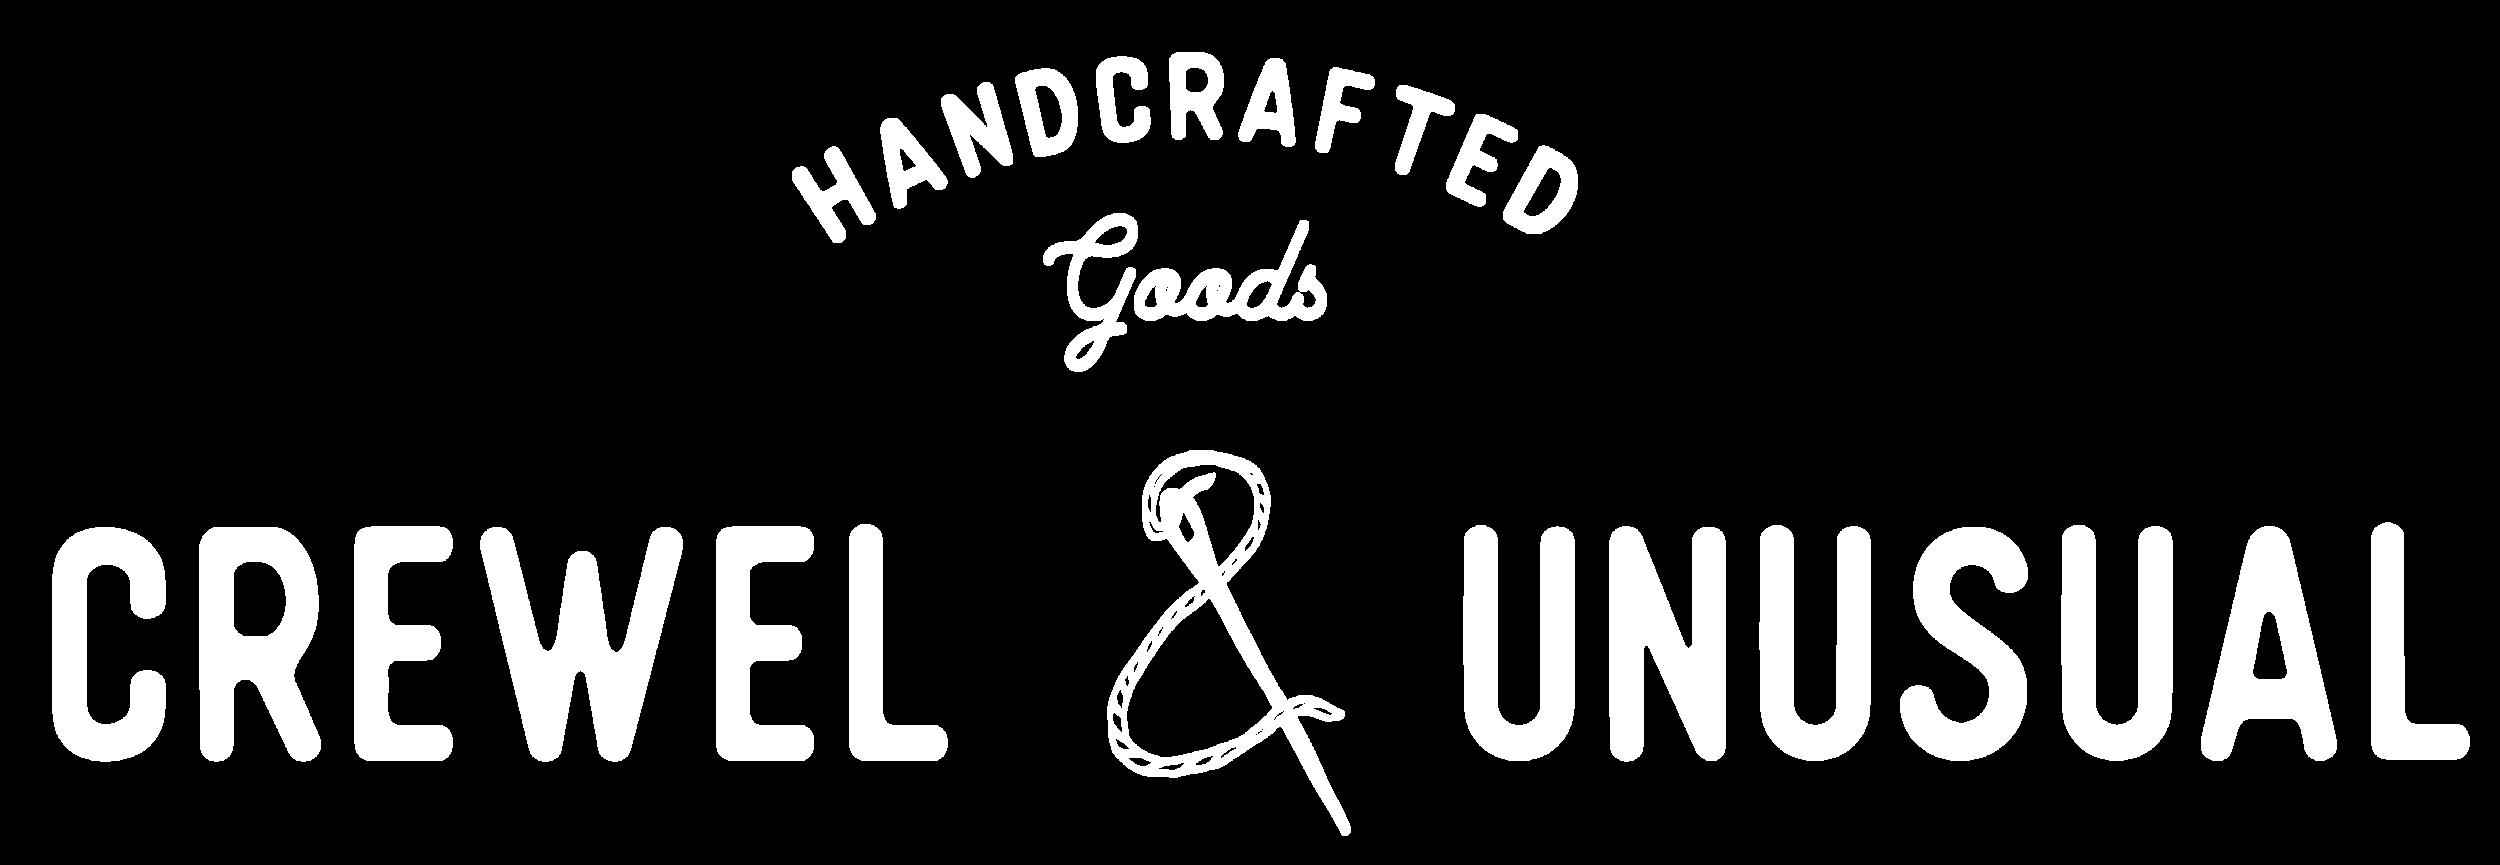 CU_main-logo_reverse.png